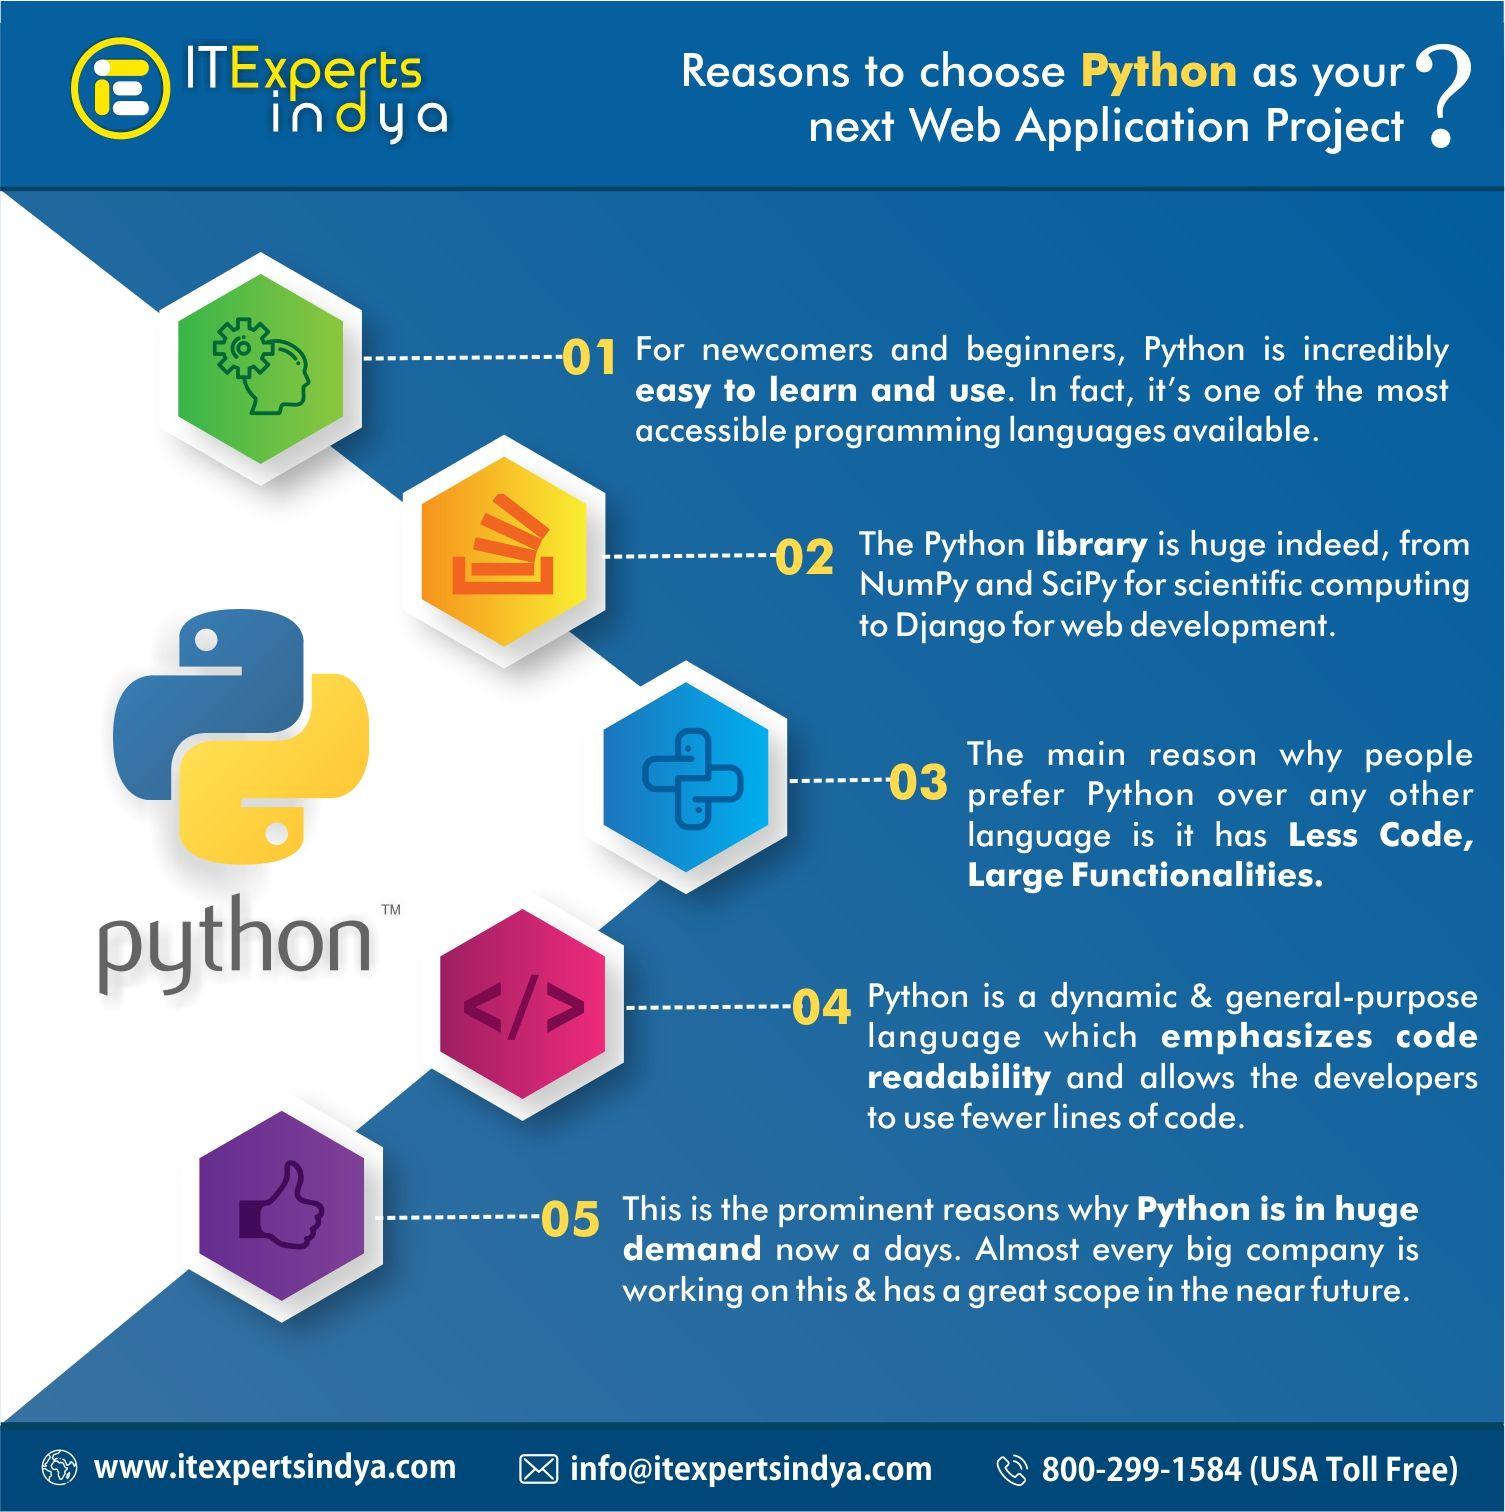 d16235c276e7f57c66573043469909b6 - Best Programming Language For Cloud Applications